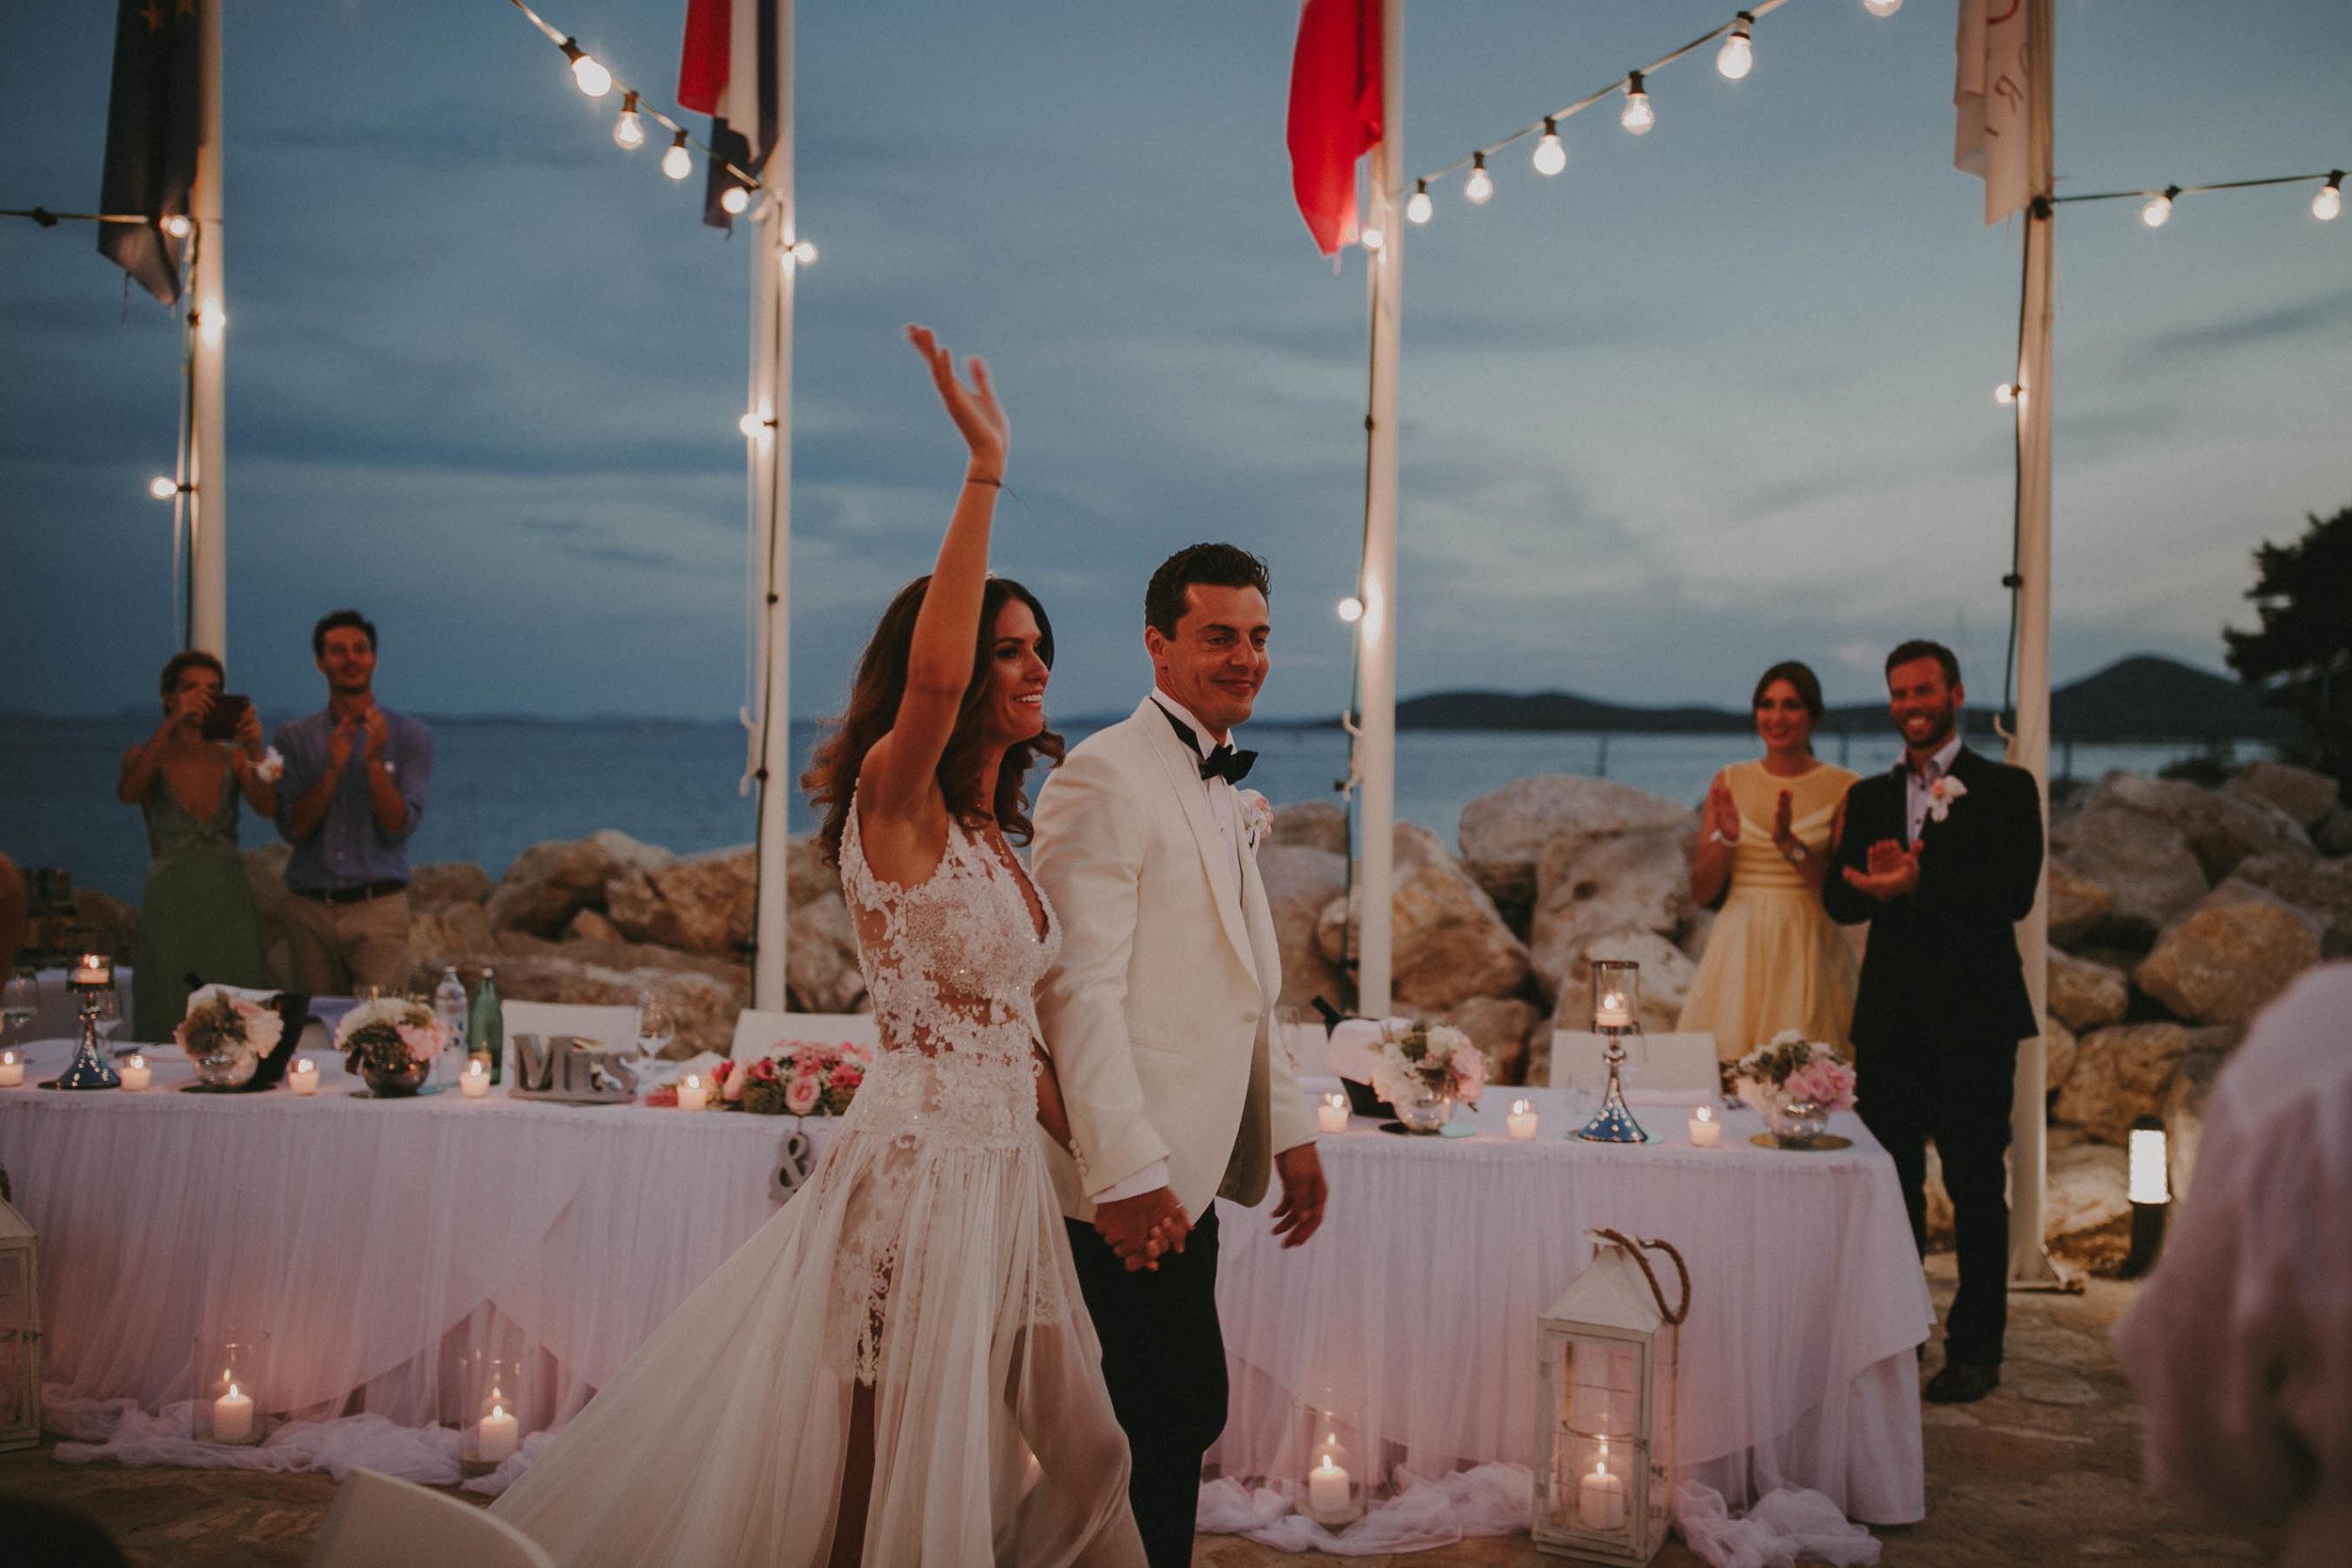 sylvia&dimitri-Wedding-Crvena_Luka-Croatia-87(9058).jpg